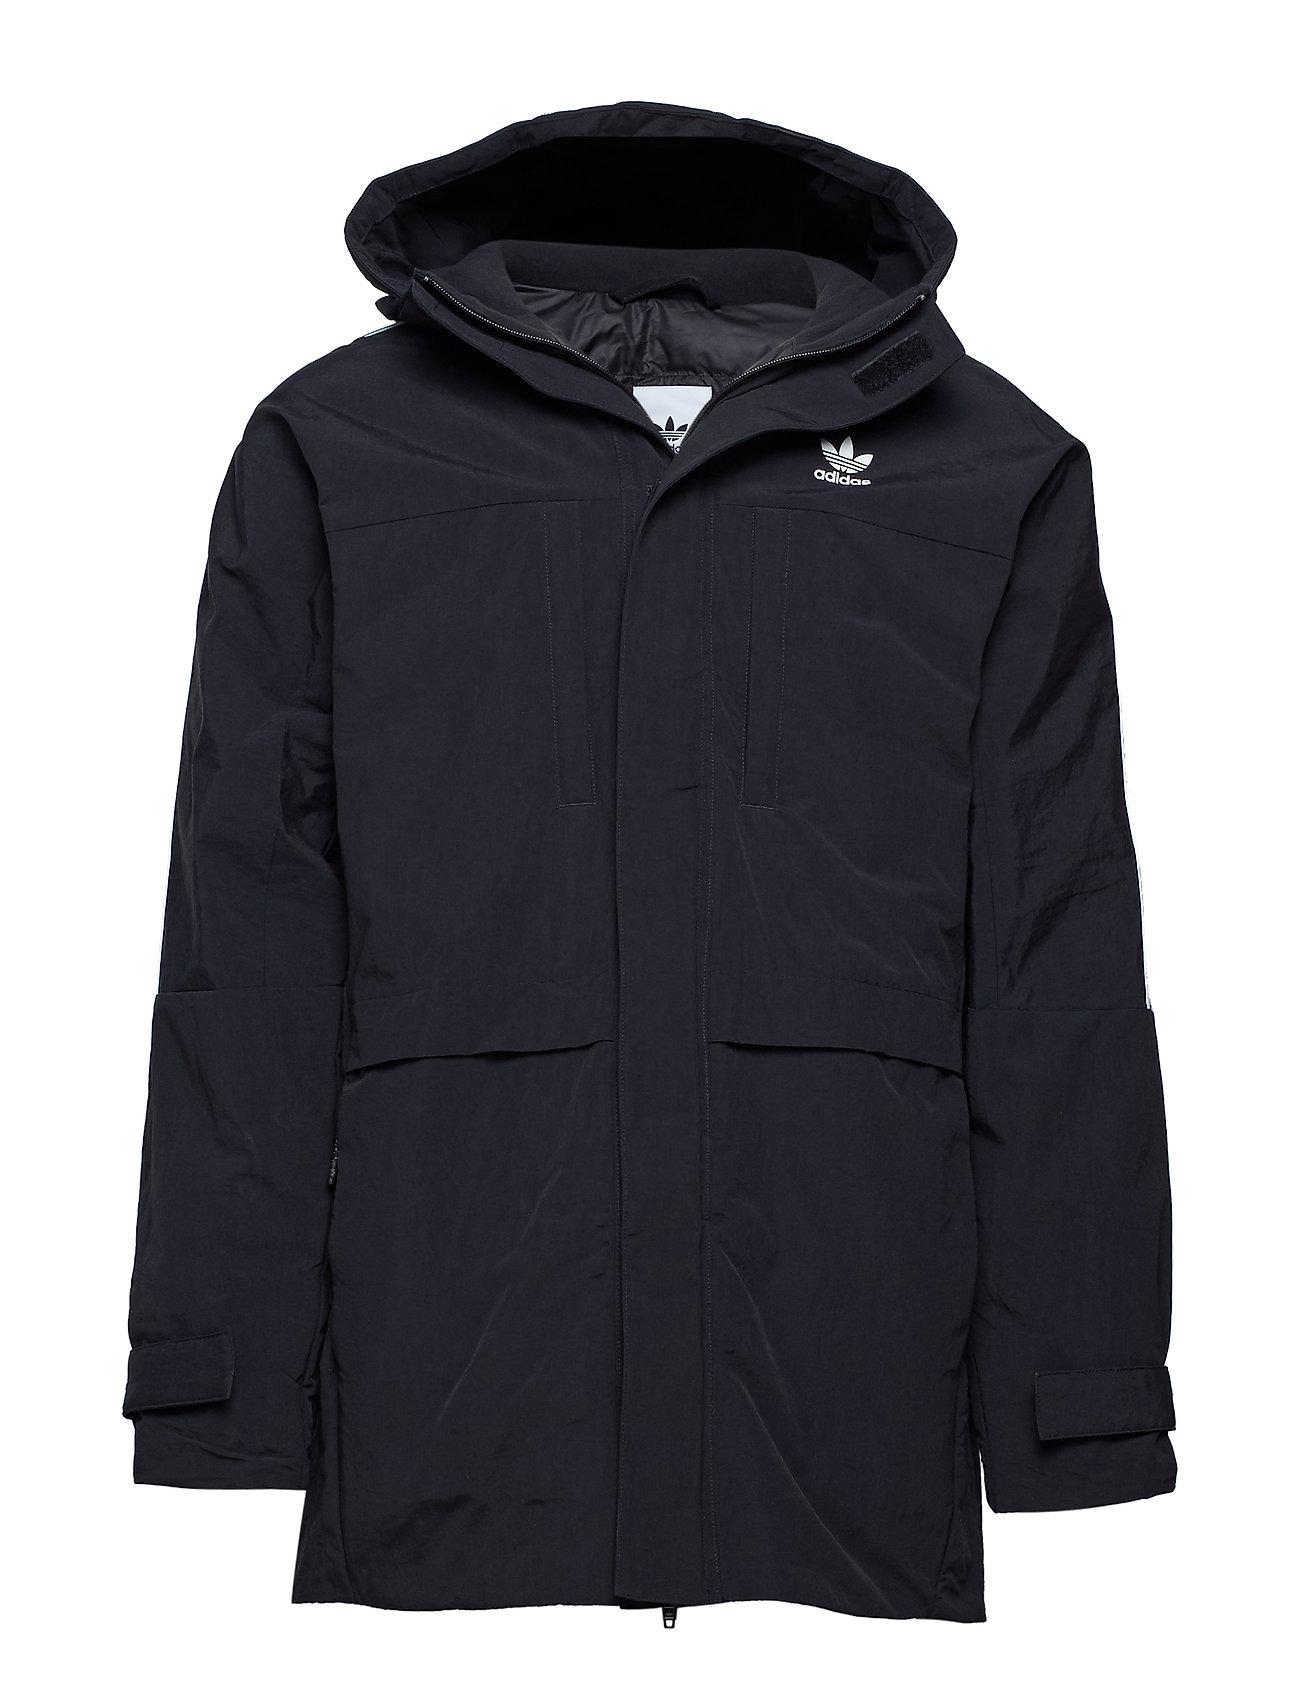 adidas Originals DOWN PARKA - BLACK